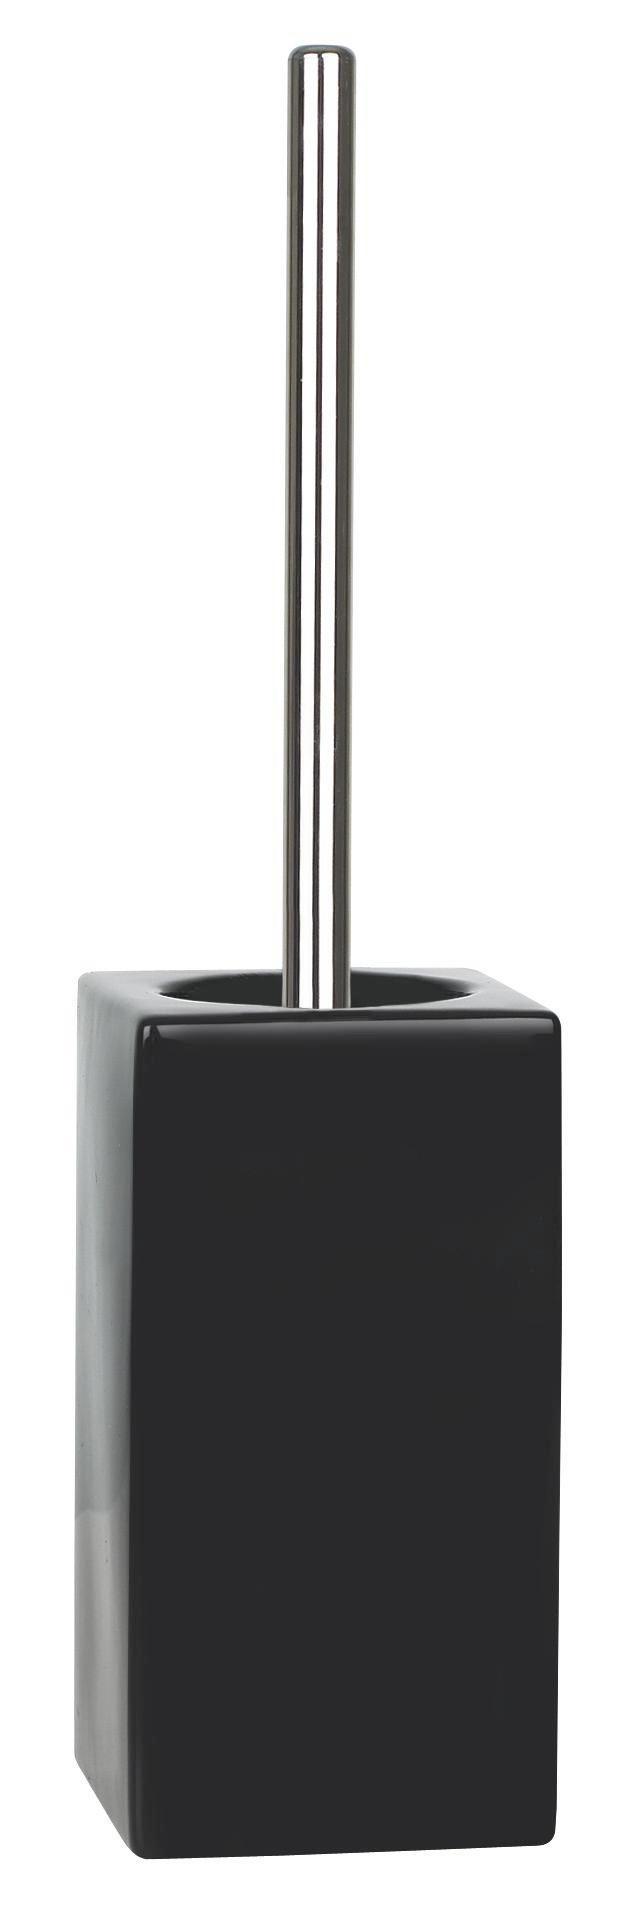 WC-BÜRSTENGARNITUR - Schwarz, Basics, Keramik/Kunststoff (11.5/45cm) - SPIRELLA